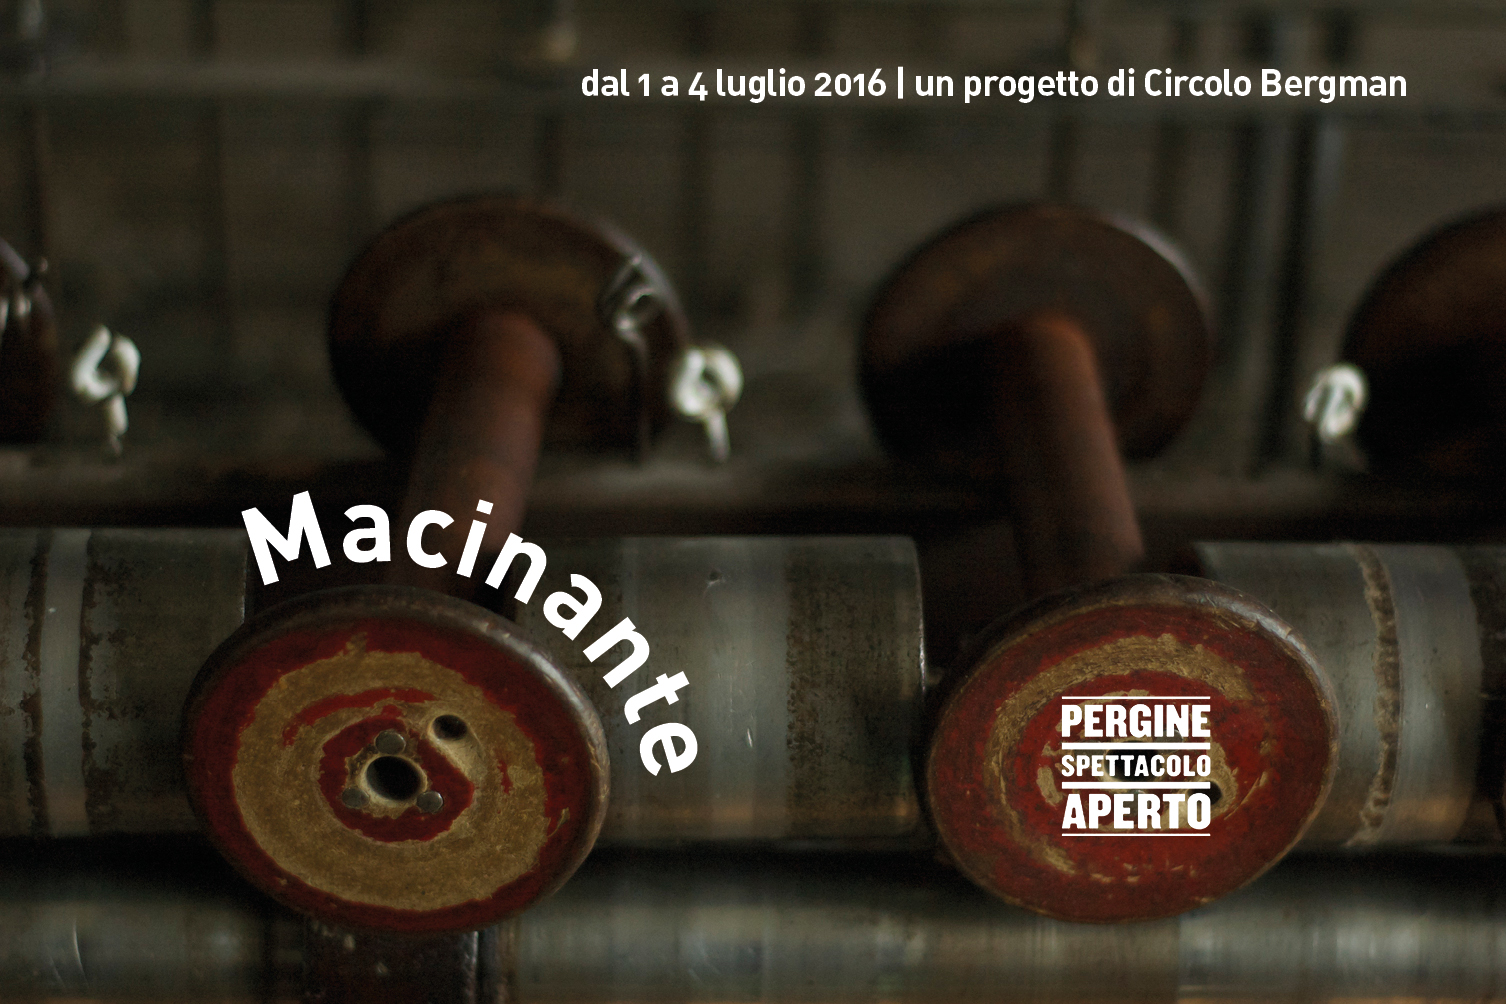 Macinante_Immagini_NEW_OK7.jpg